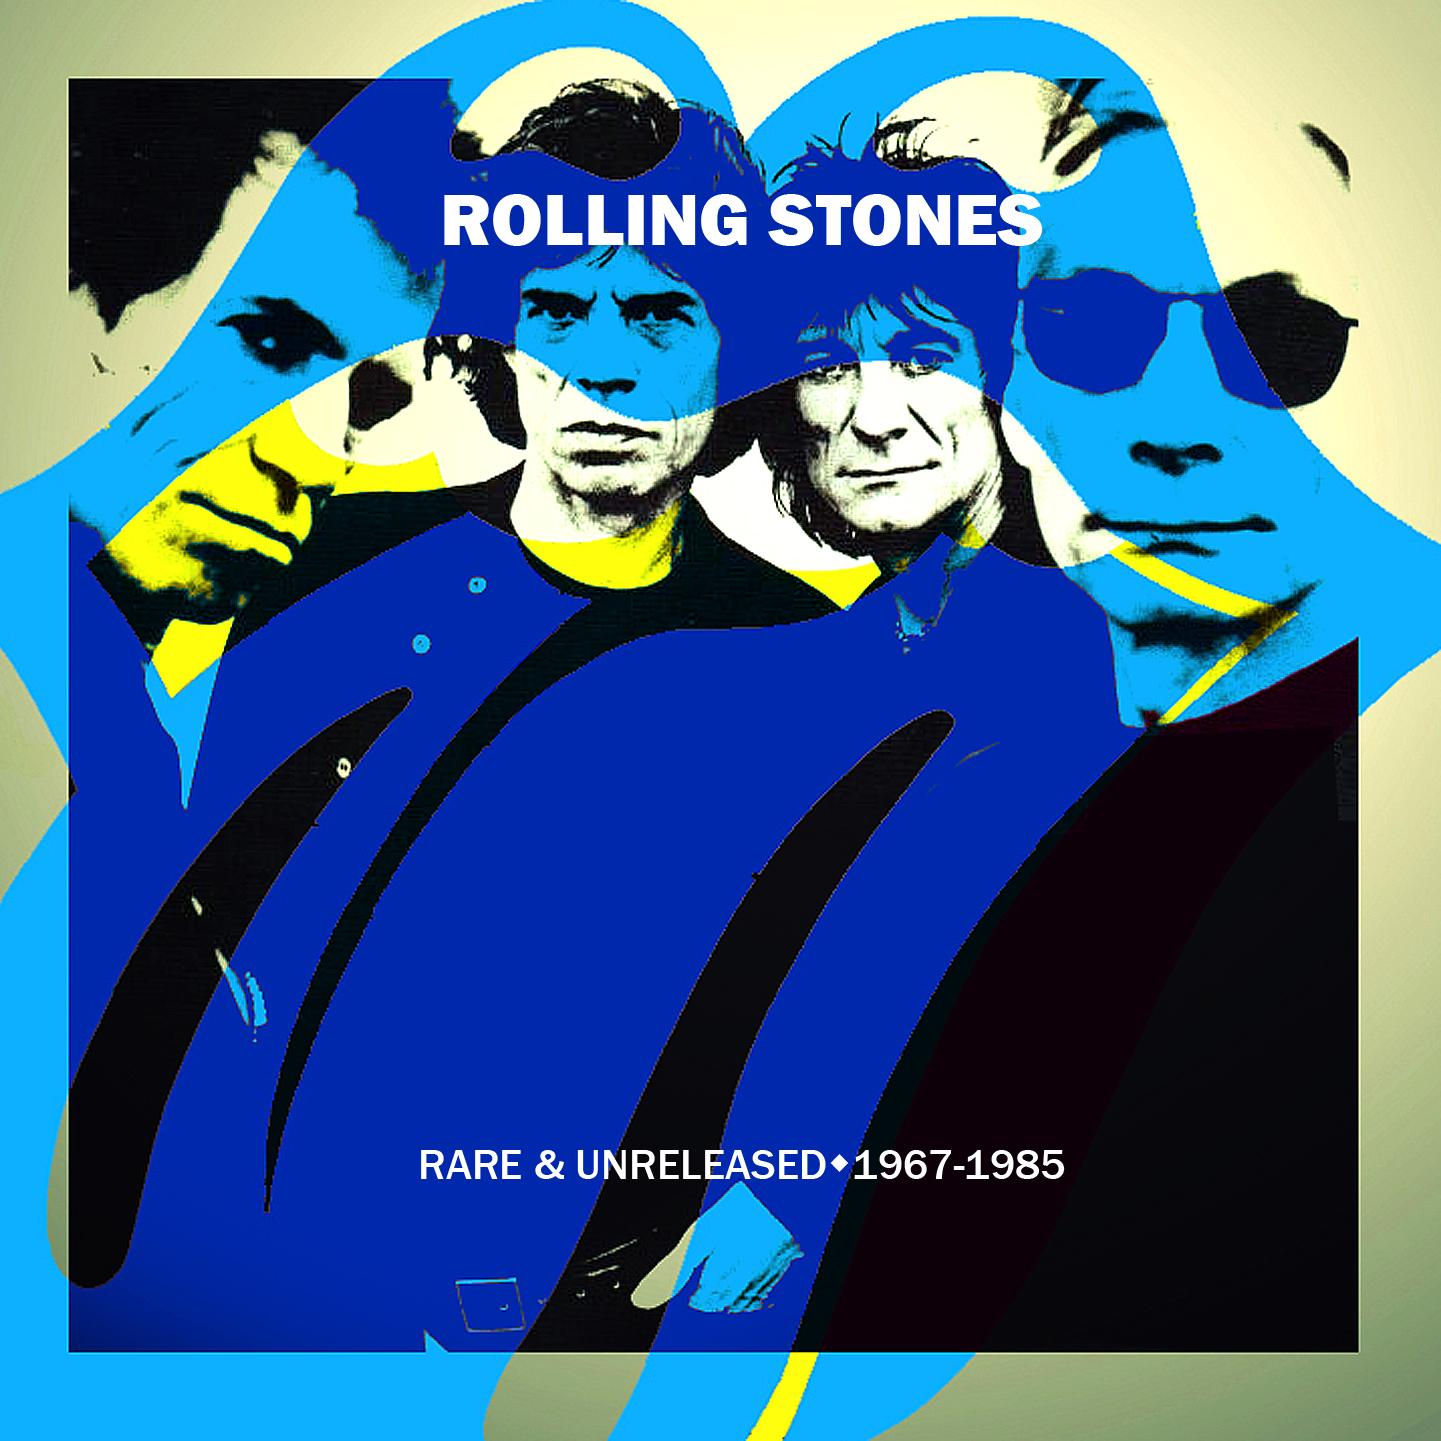 Rolling Stones Bootleg Downloads